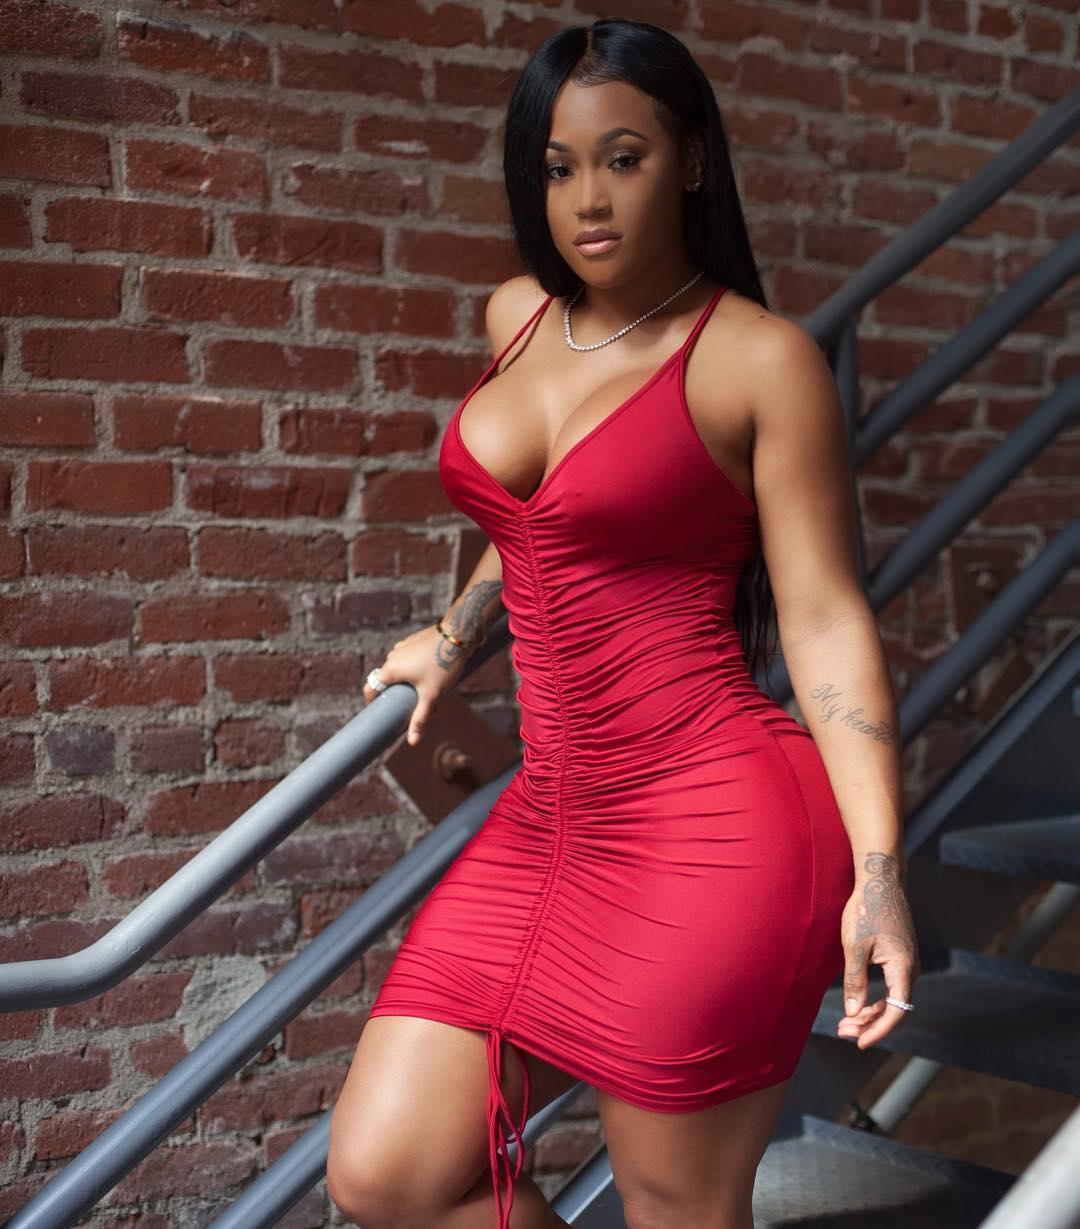 Lira Galore | Sexy Pics On -DynastySeries.com